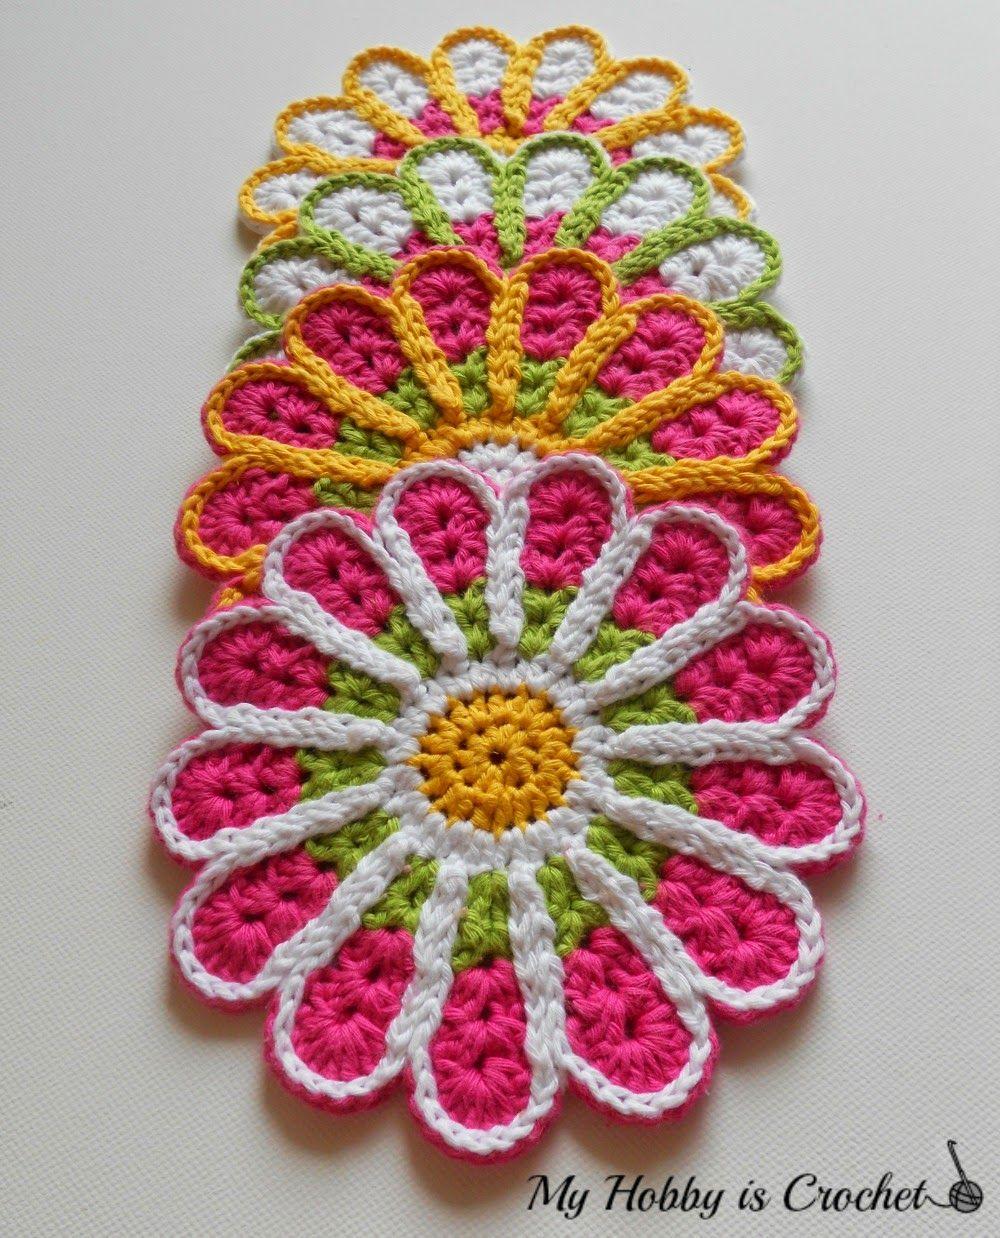 My Hobby Is Crochet: Chrysanthemum/ Flower Coaster – Free Crochet Pattern Review •✿•  Teresa Restegui http://www.pinterest.com/teretegui/ •✿•